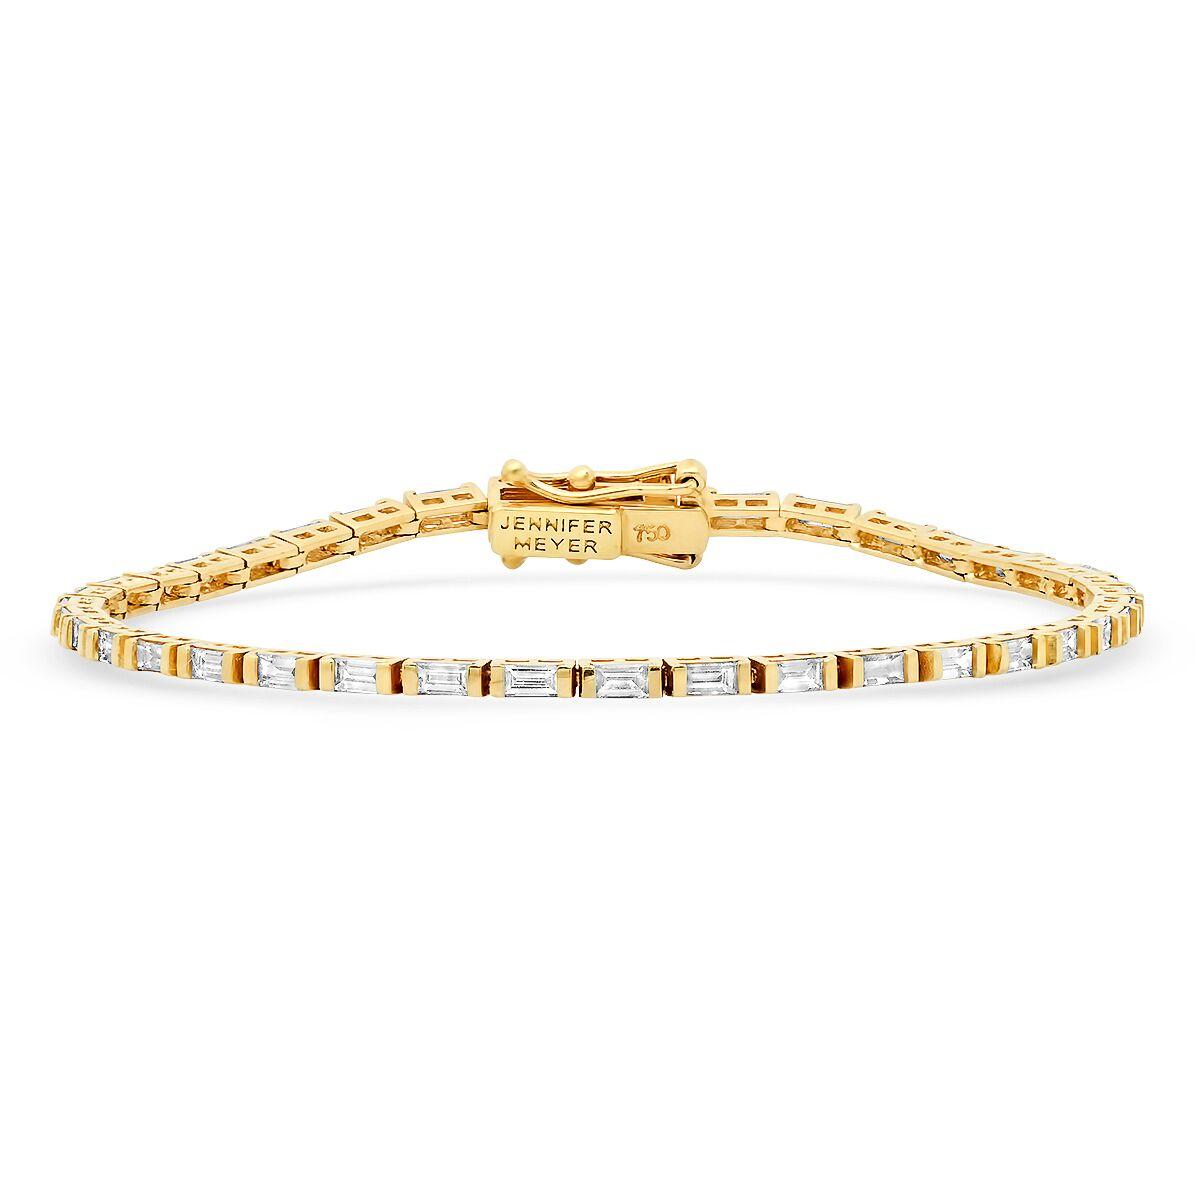 Jennifer Meyer baguette tennis bracelet